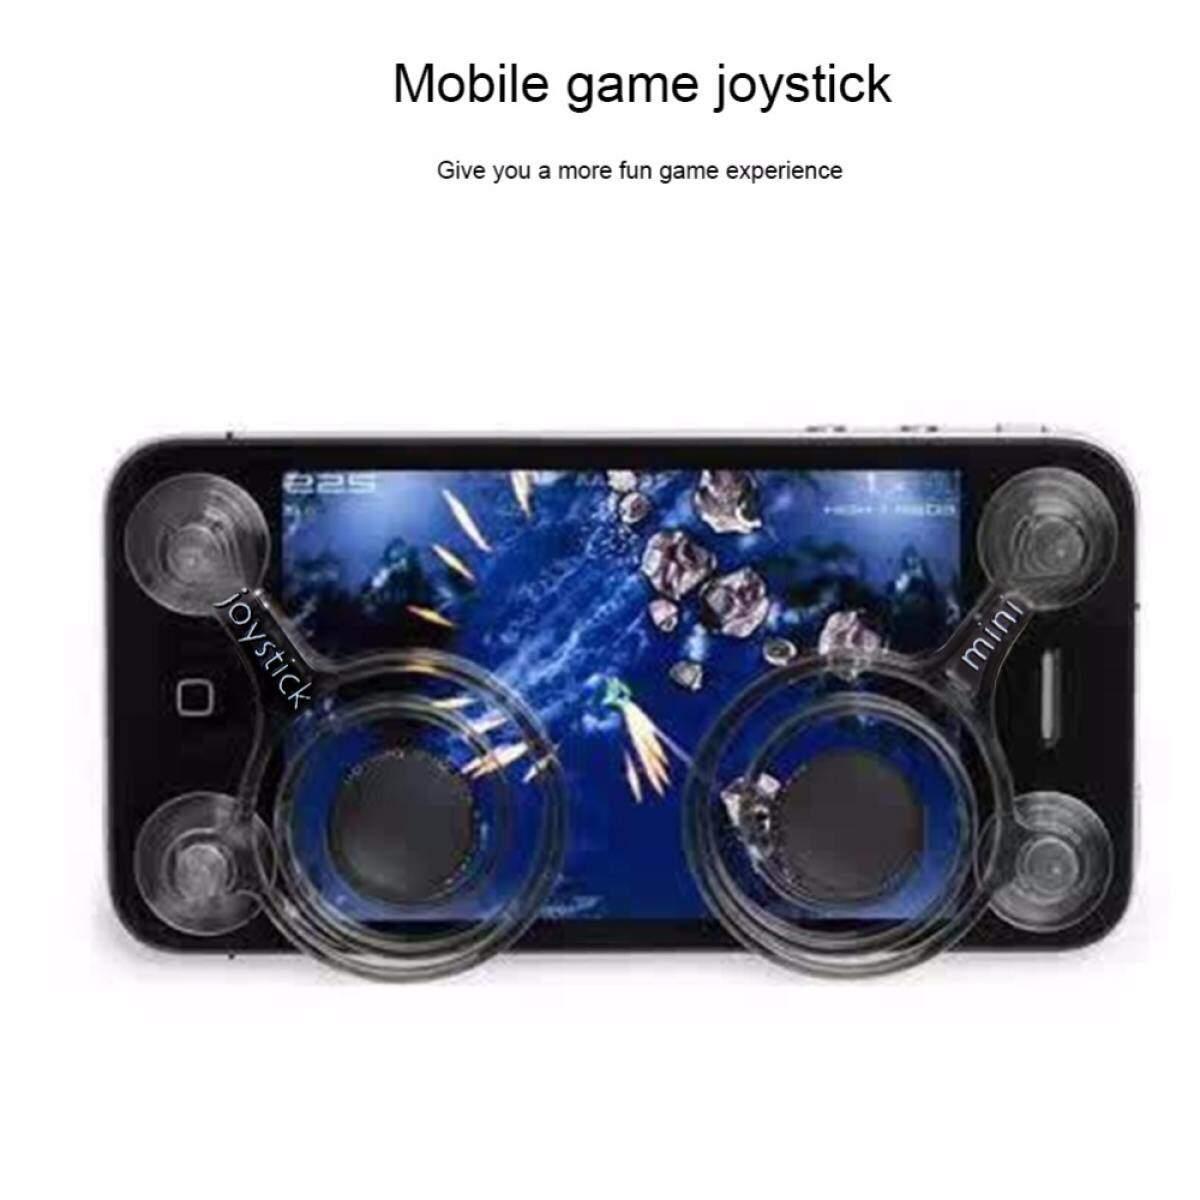 2pcs/Set Zero Any Touch Screen Joystick Smartphone mobile phone Joysticks mobile Mini Joysticks For Phone tablet Arcade Games